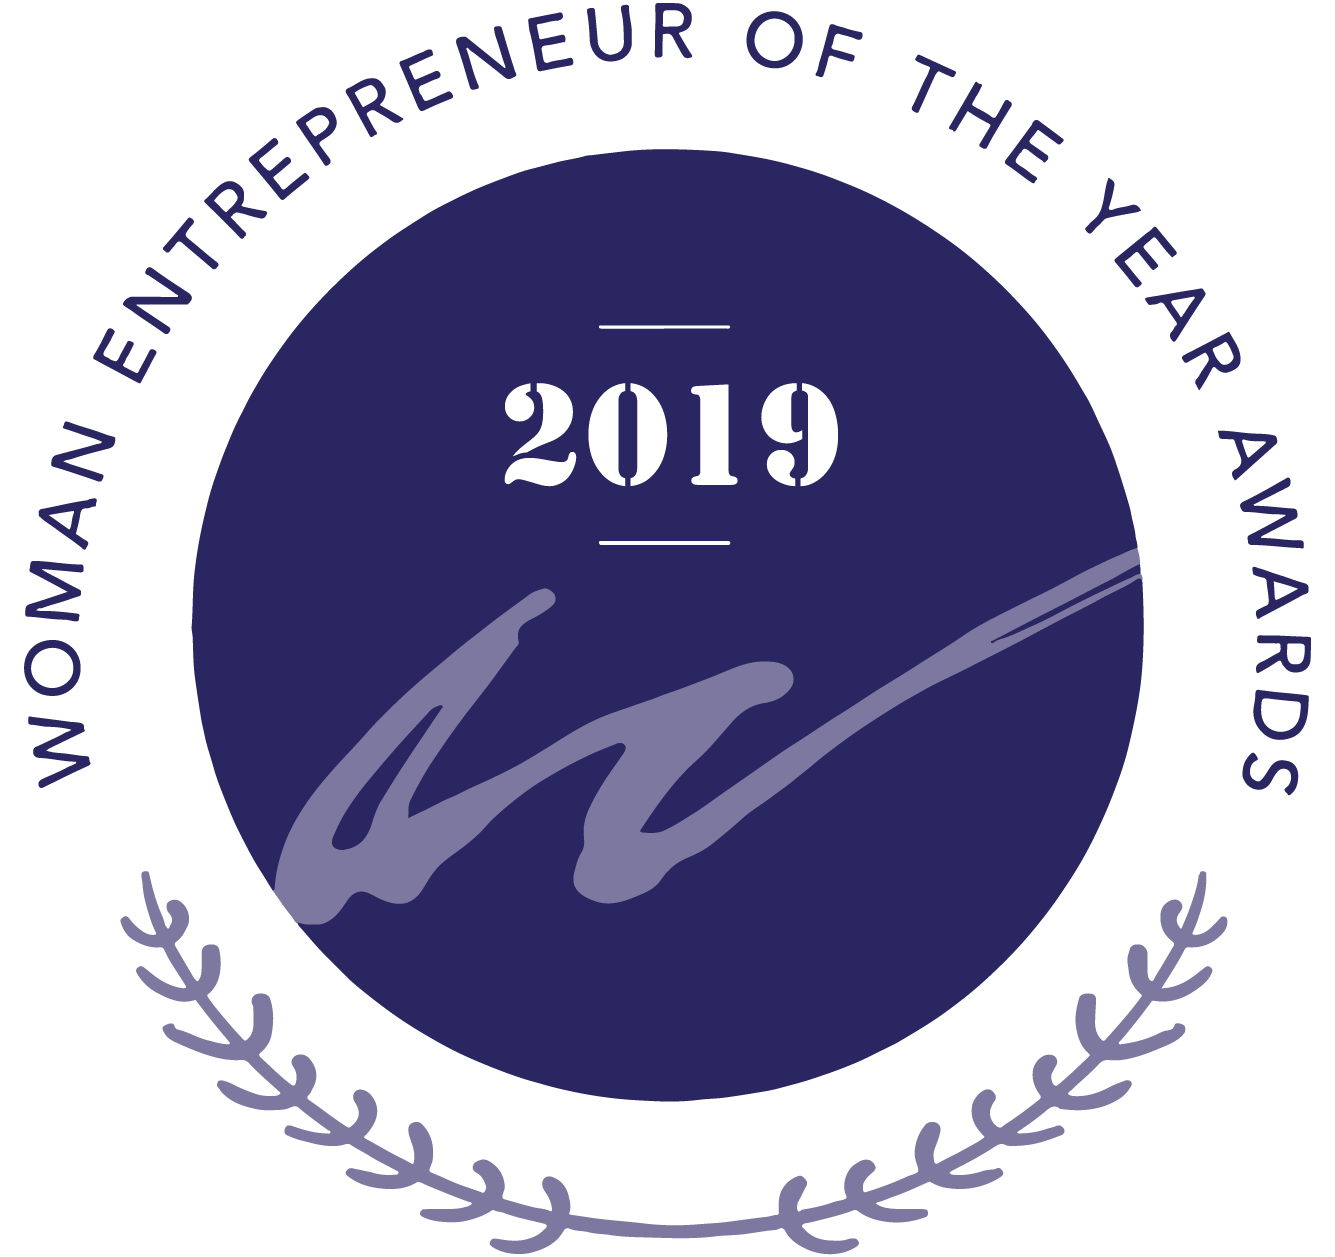 Woman Entrepreneur of the Year Awards (WEYA)